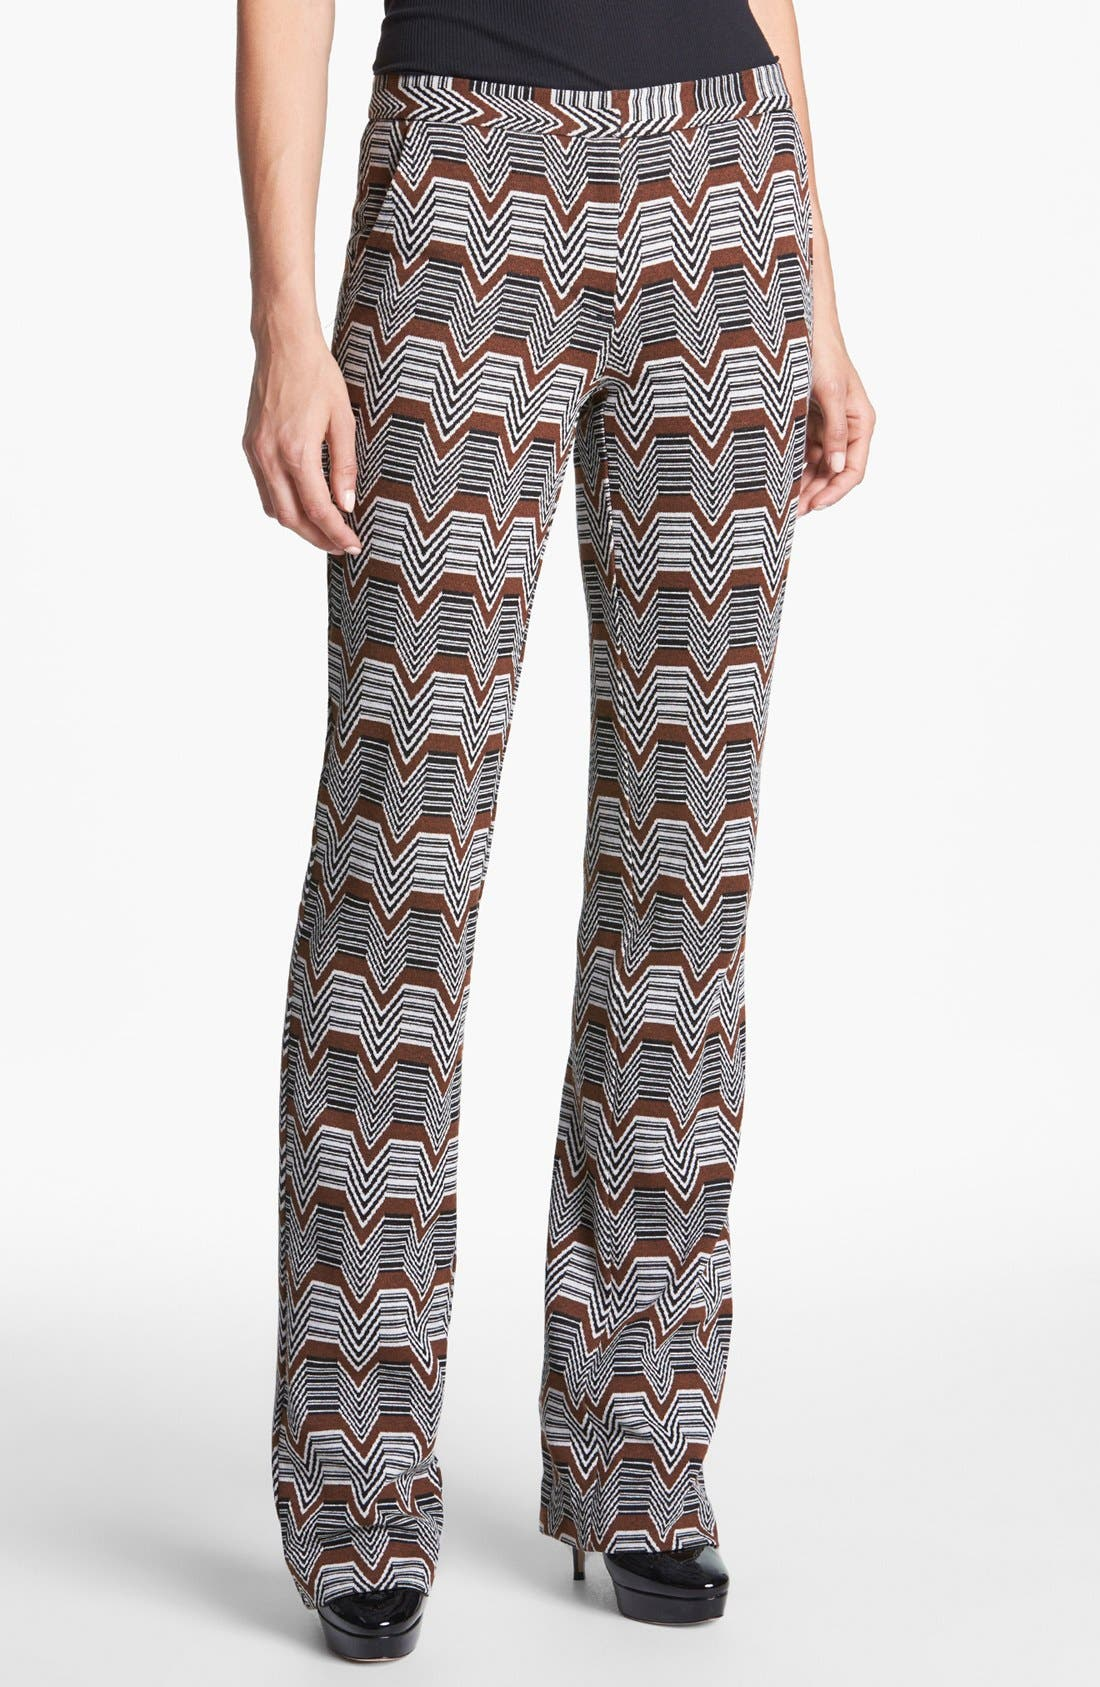 Main Image - Trina Turk 'Rocco' Jacquard Pants